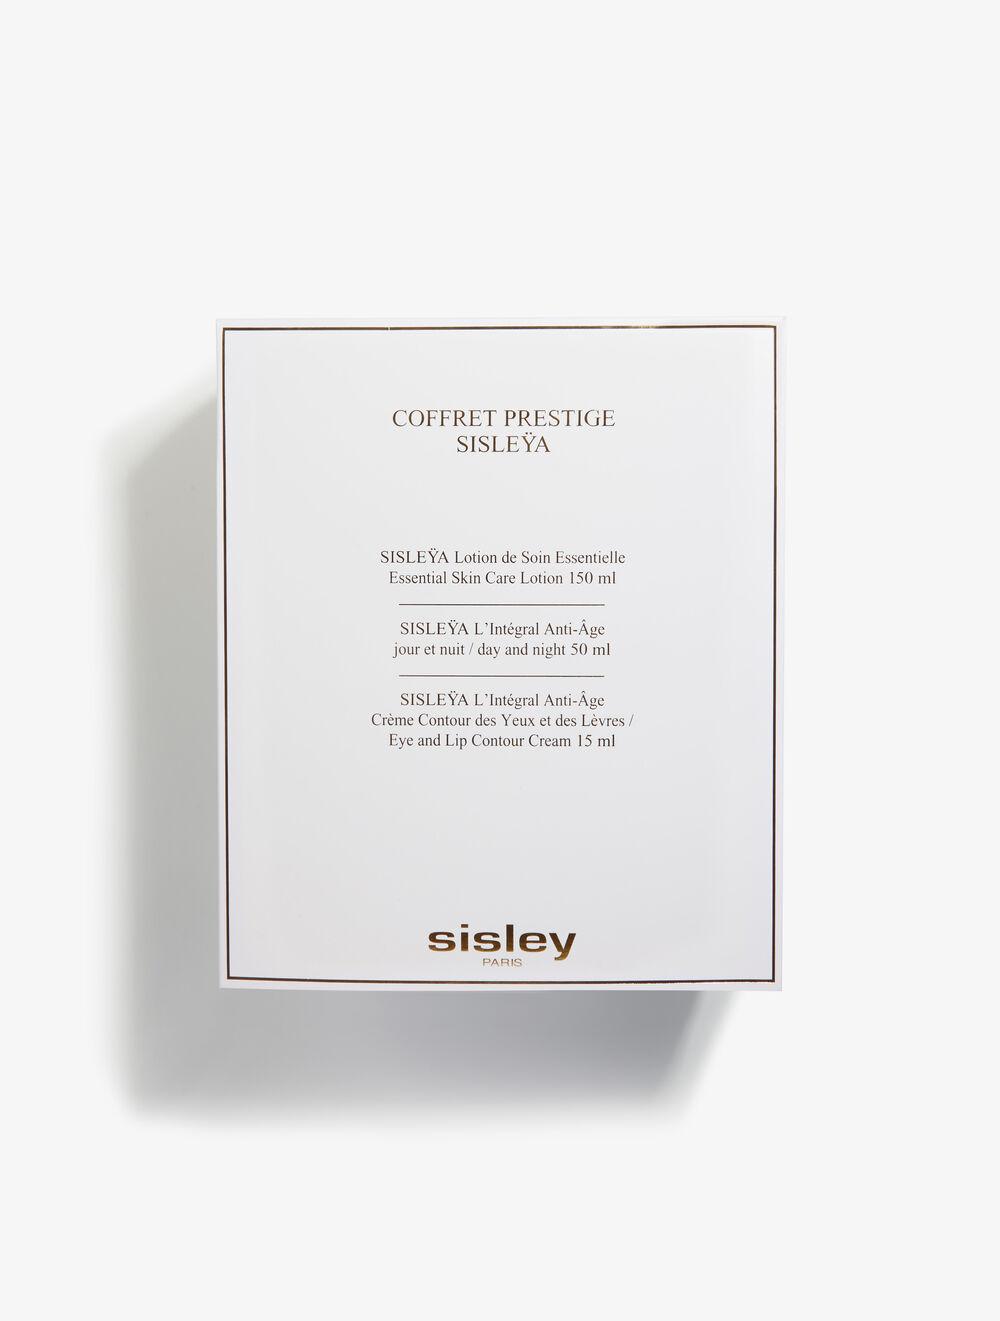 Coffret Prestige Sisleya